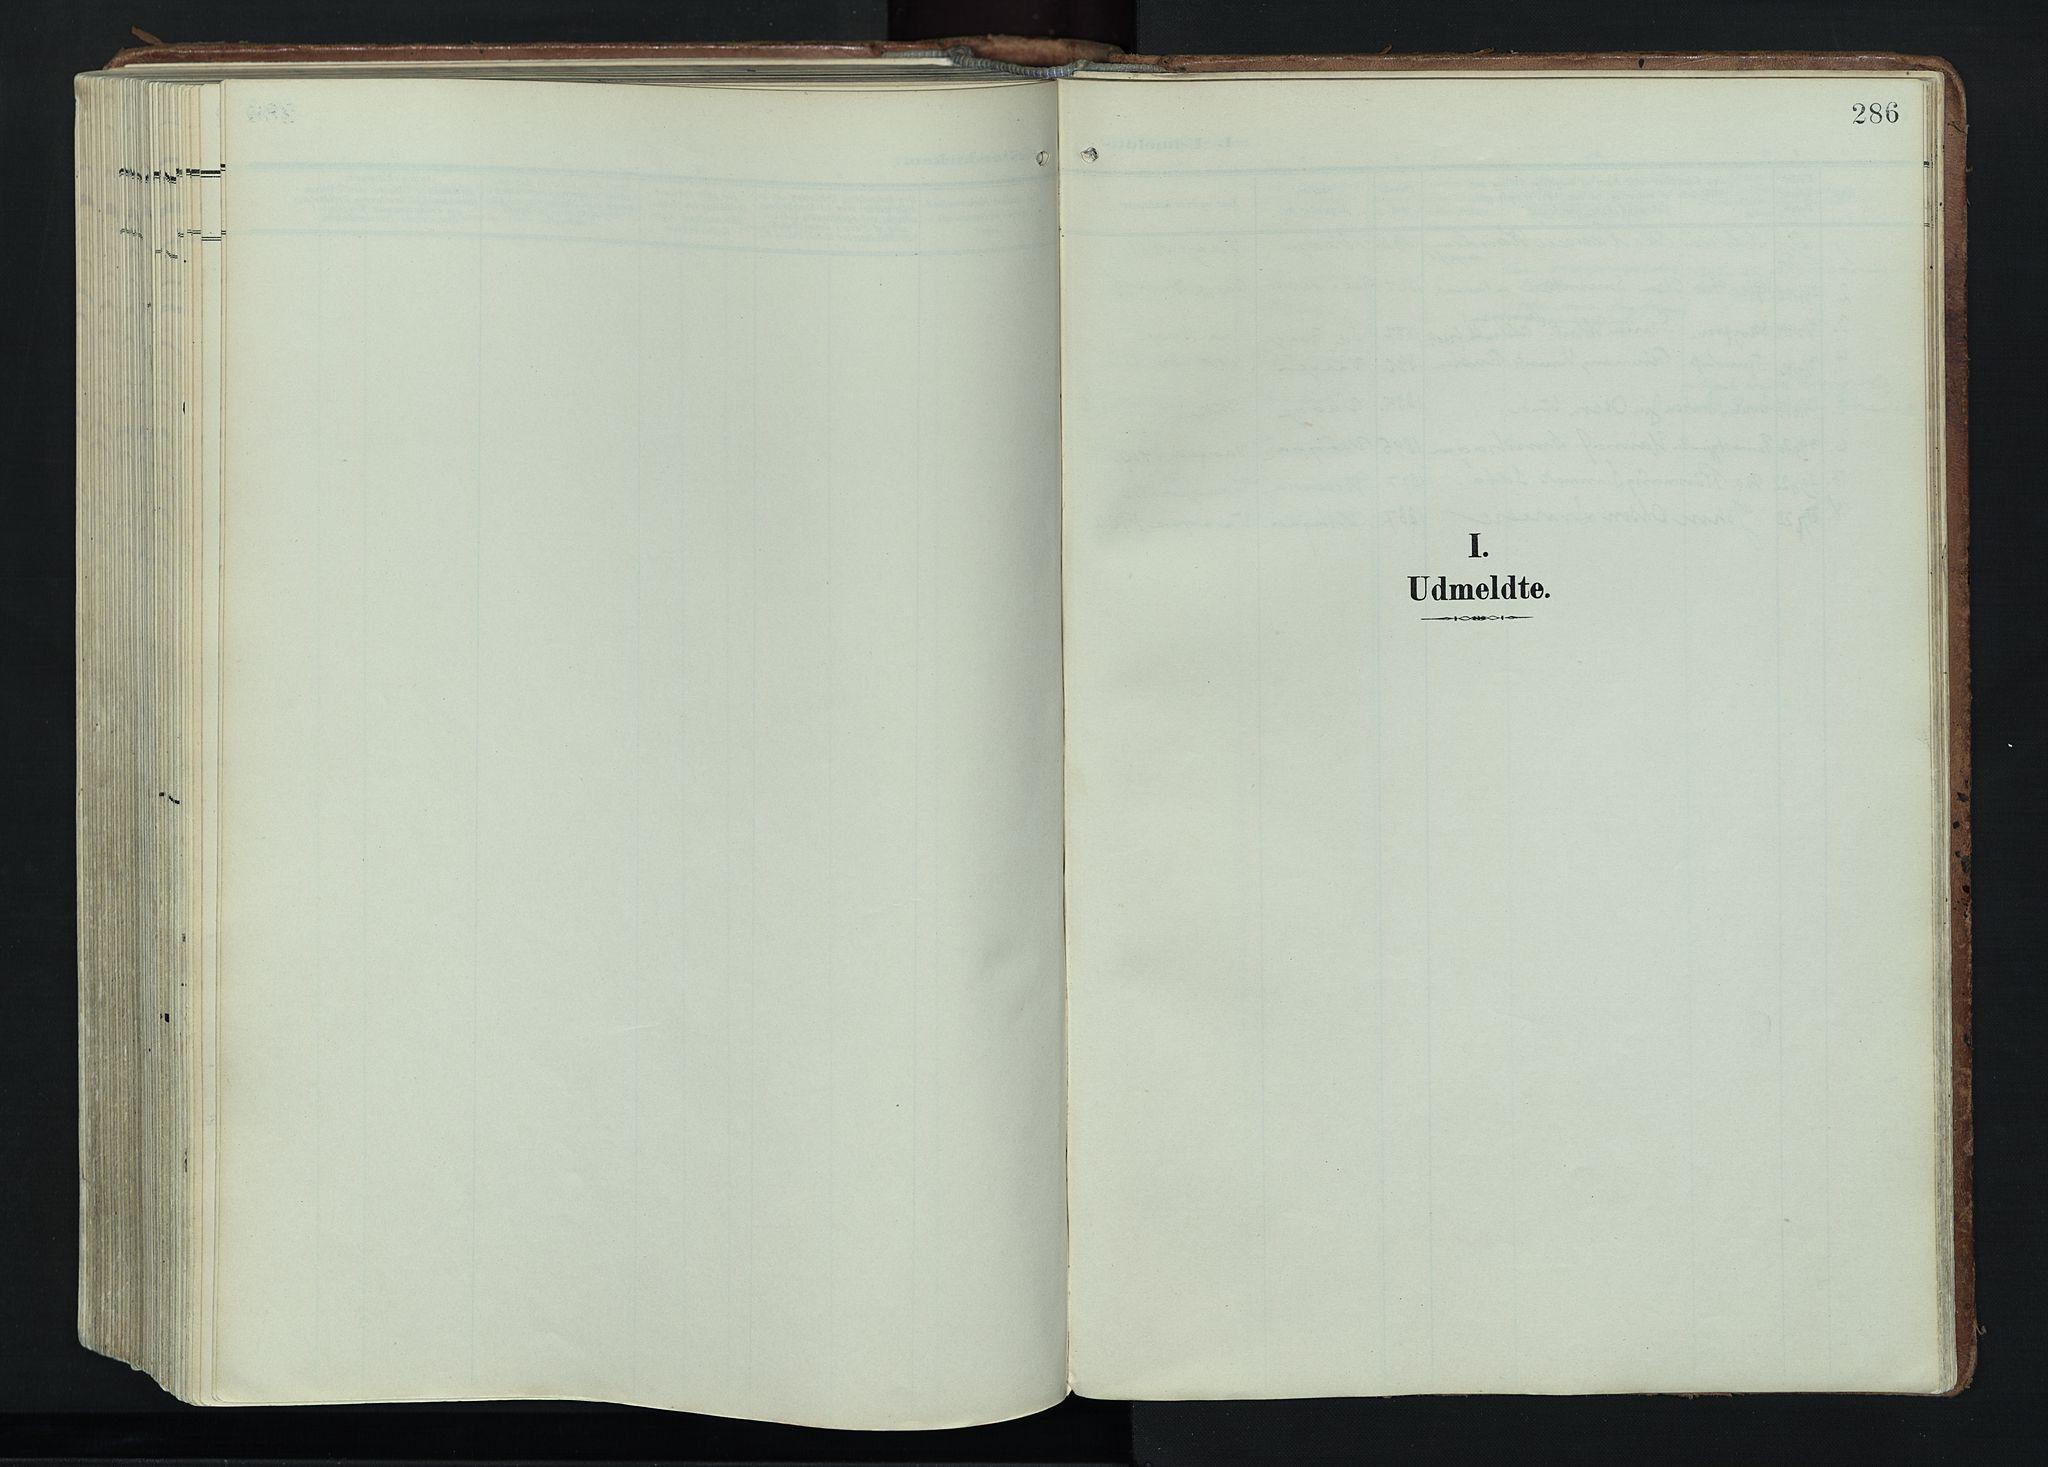 SAH, Vågå prestekontor, Ministerialbok nr. 11, 1905-1924, s. 286